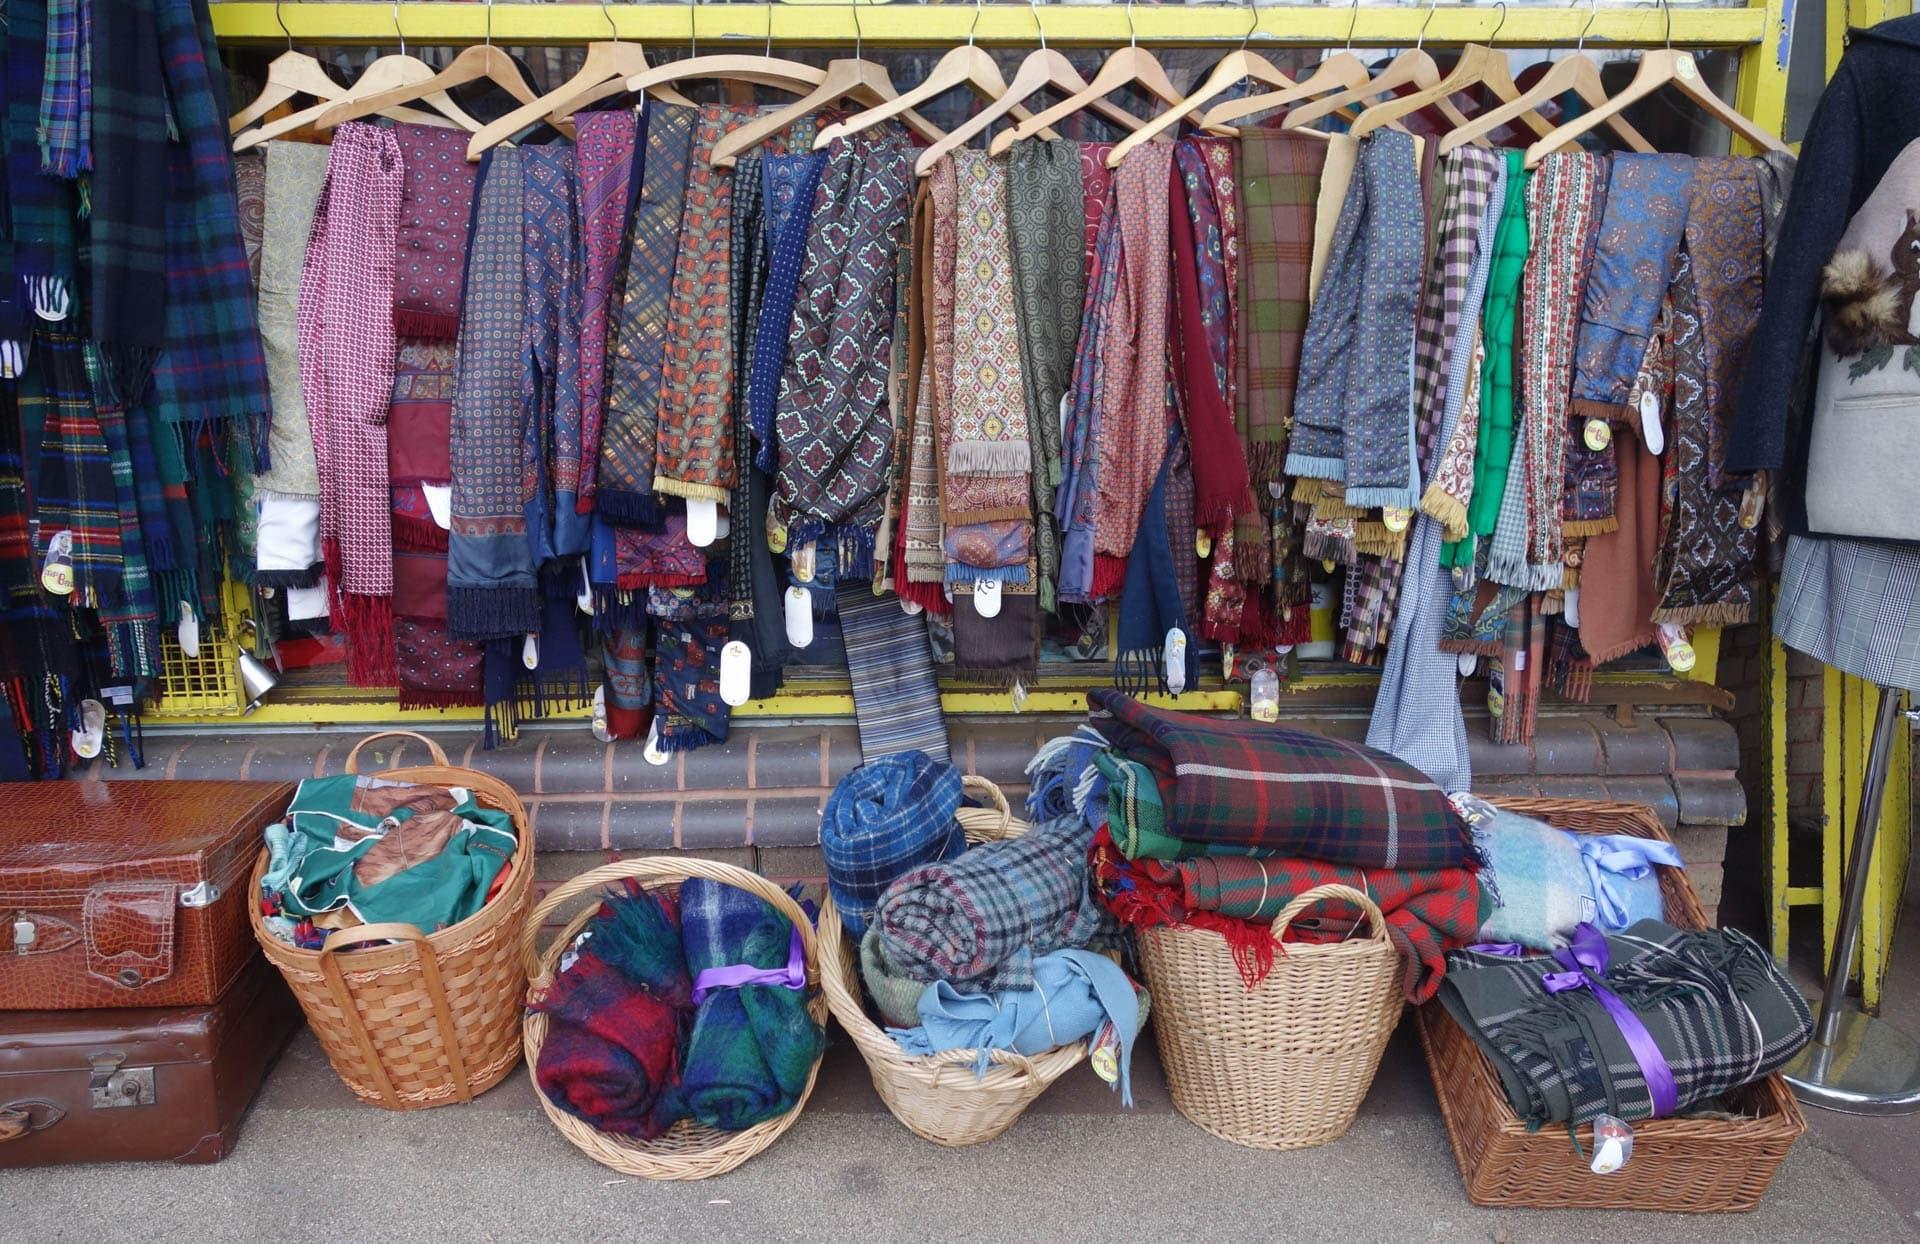 Second-hand fabrics, tartans and tweeds at Glasgow's Barras vintage market